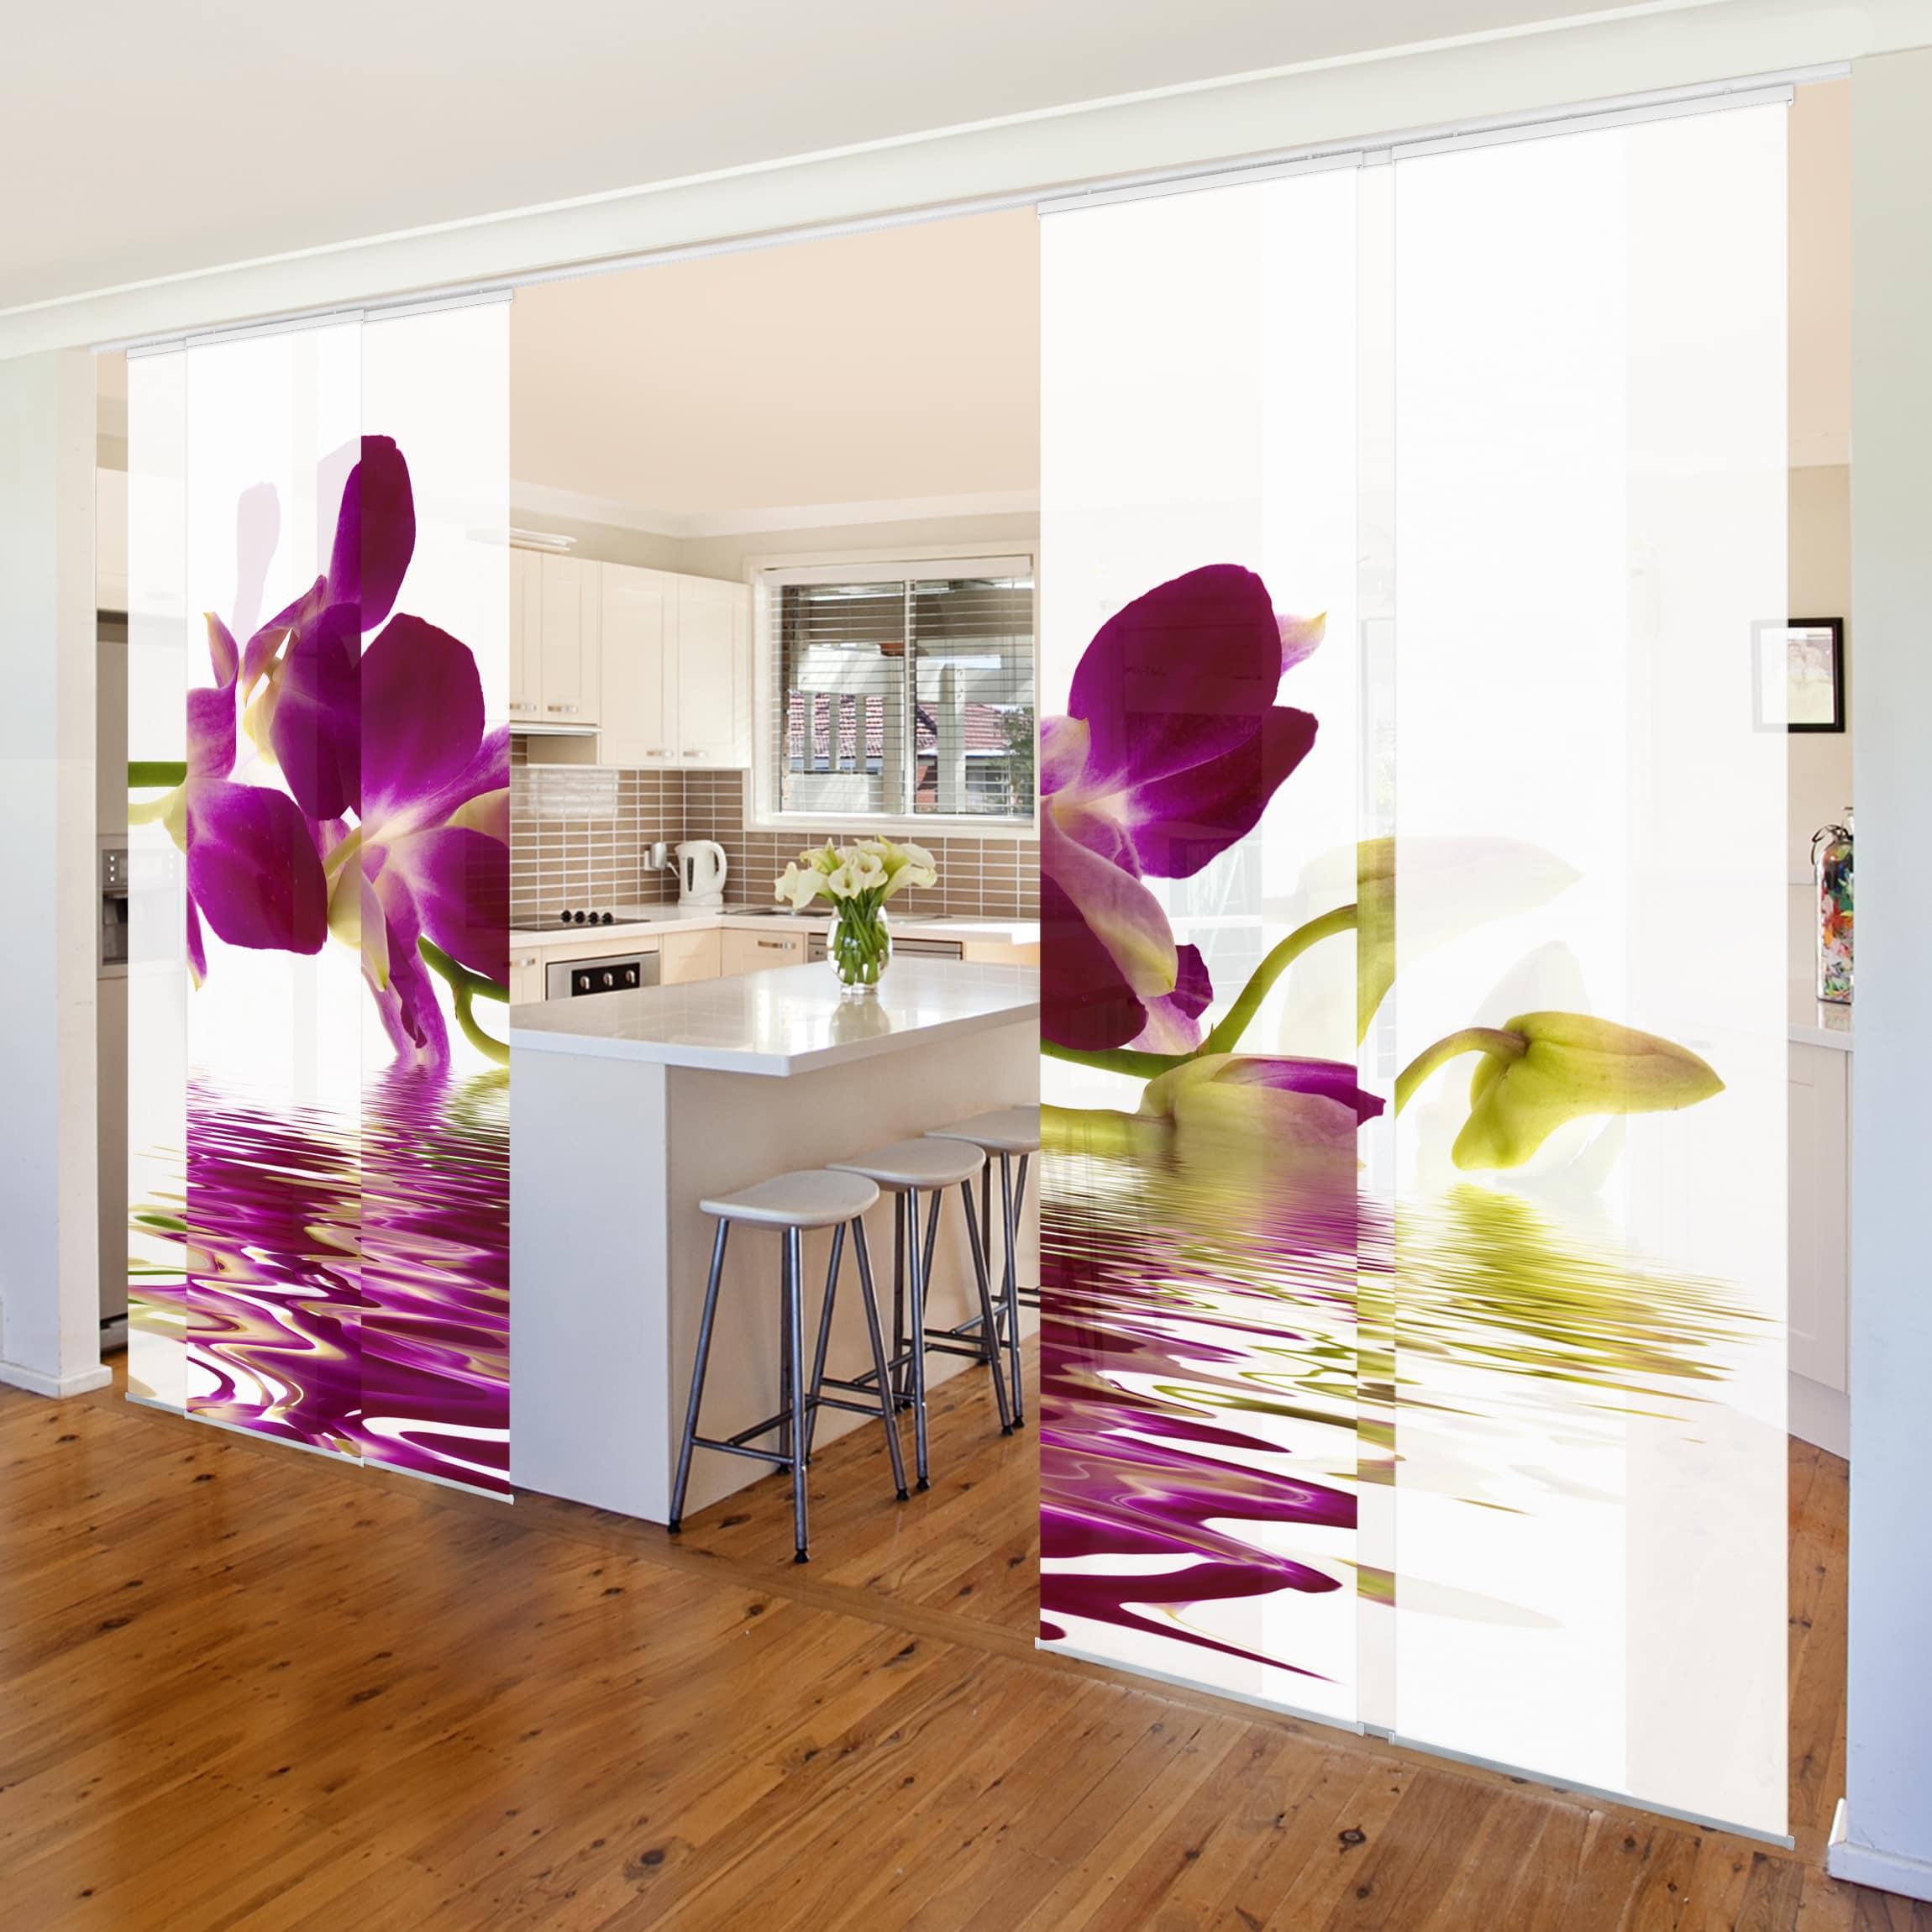 schiebegardinen set pink orchid waters 6 fl chenvorh nge. Black Bedroom Furniture Sets. Home Design Ideas